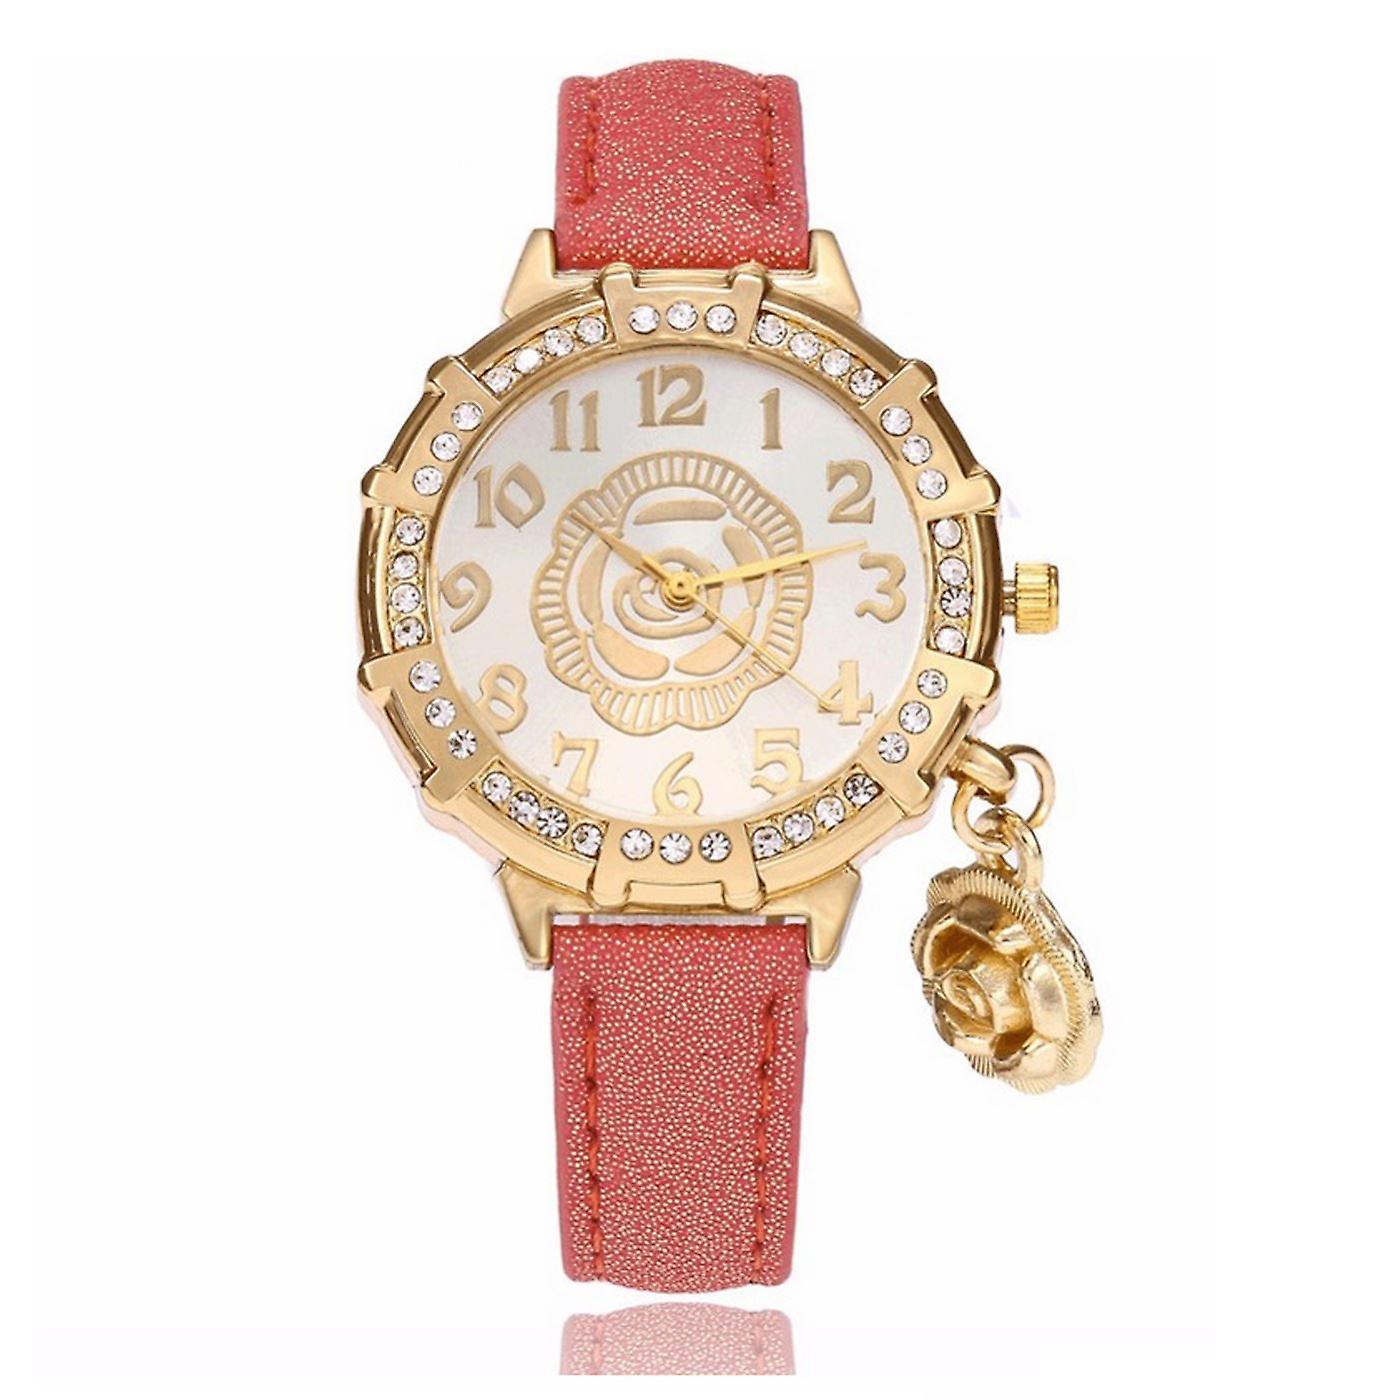 Classy Yellow Gold Flower Watch Luxury Stones Elegant Time ROSE